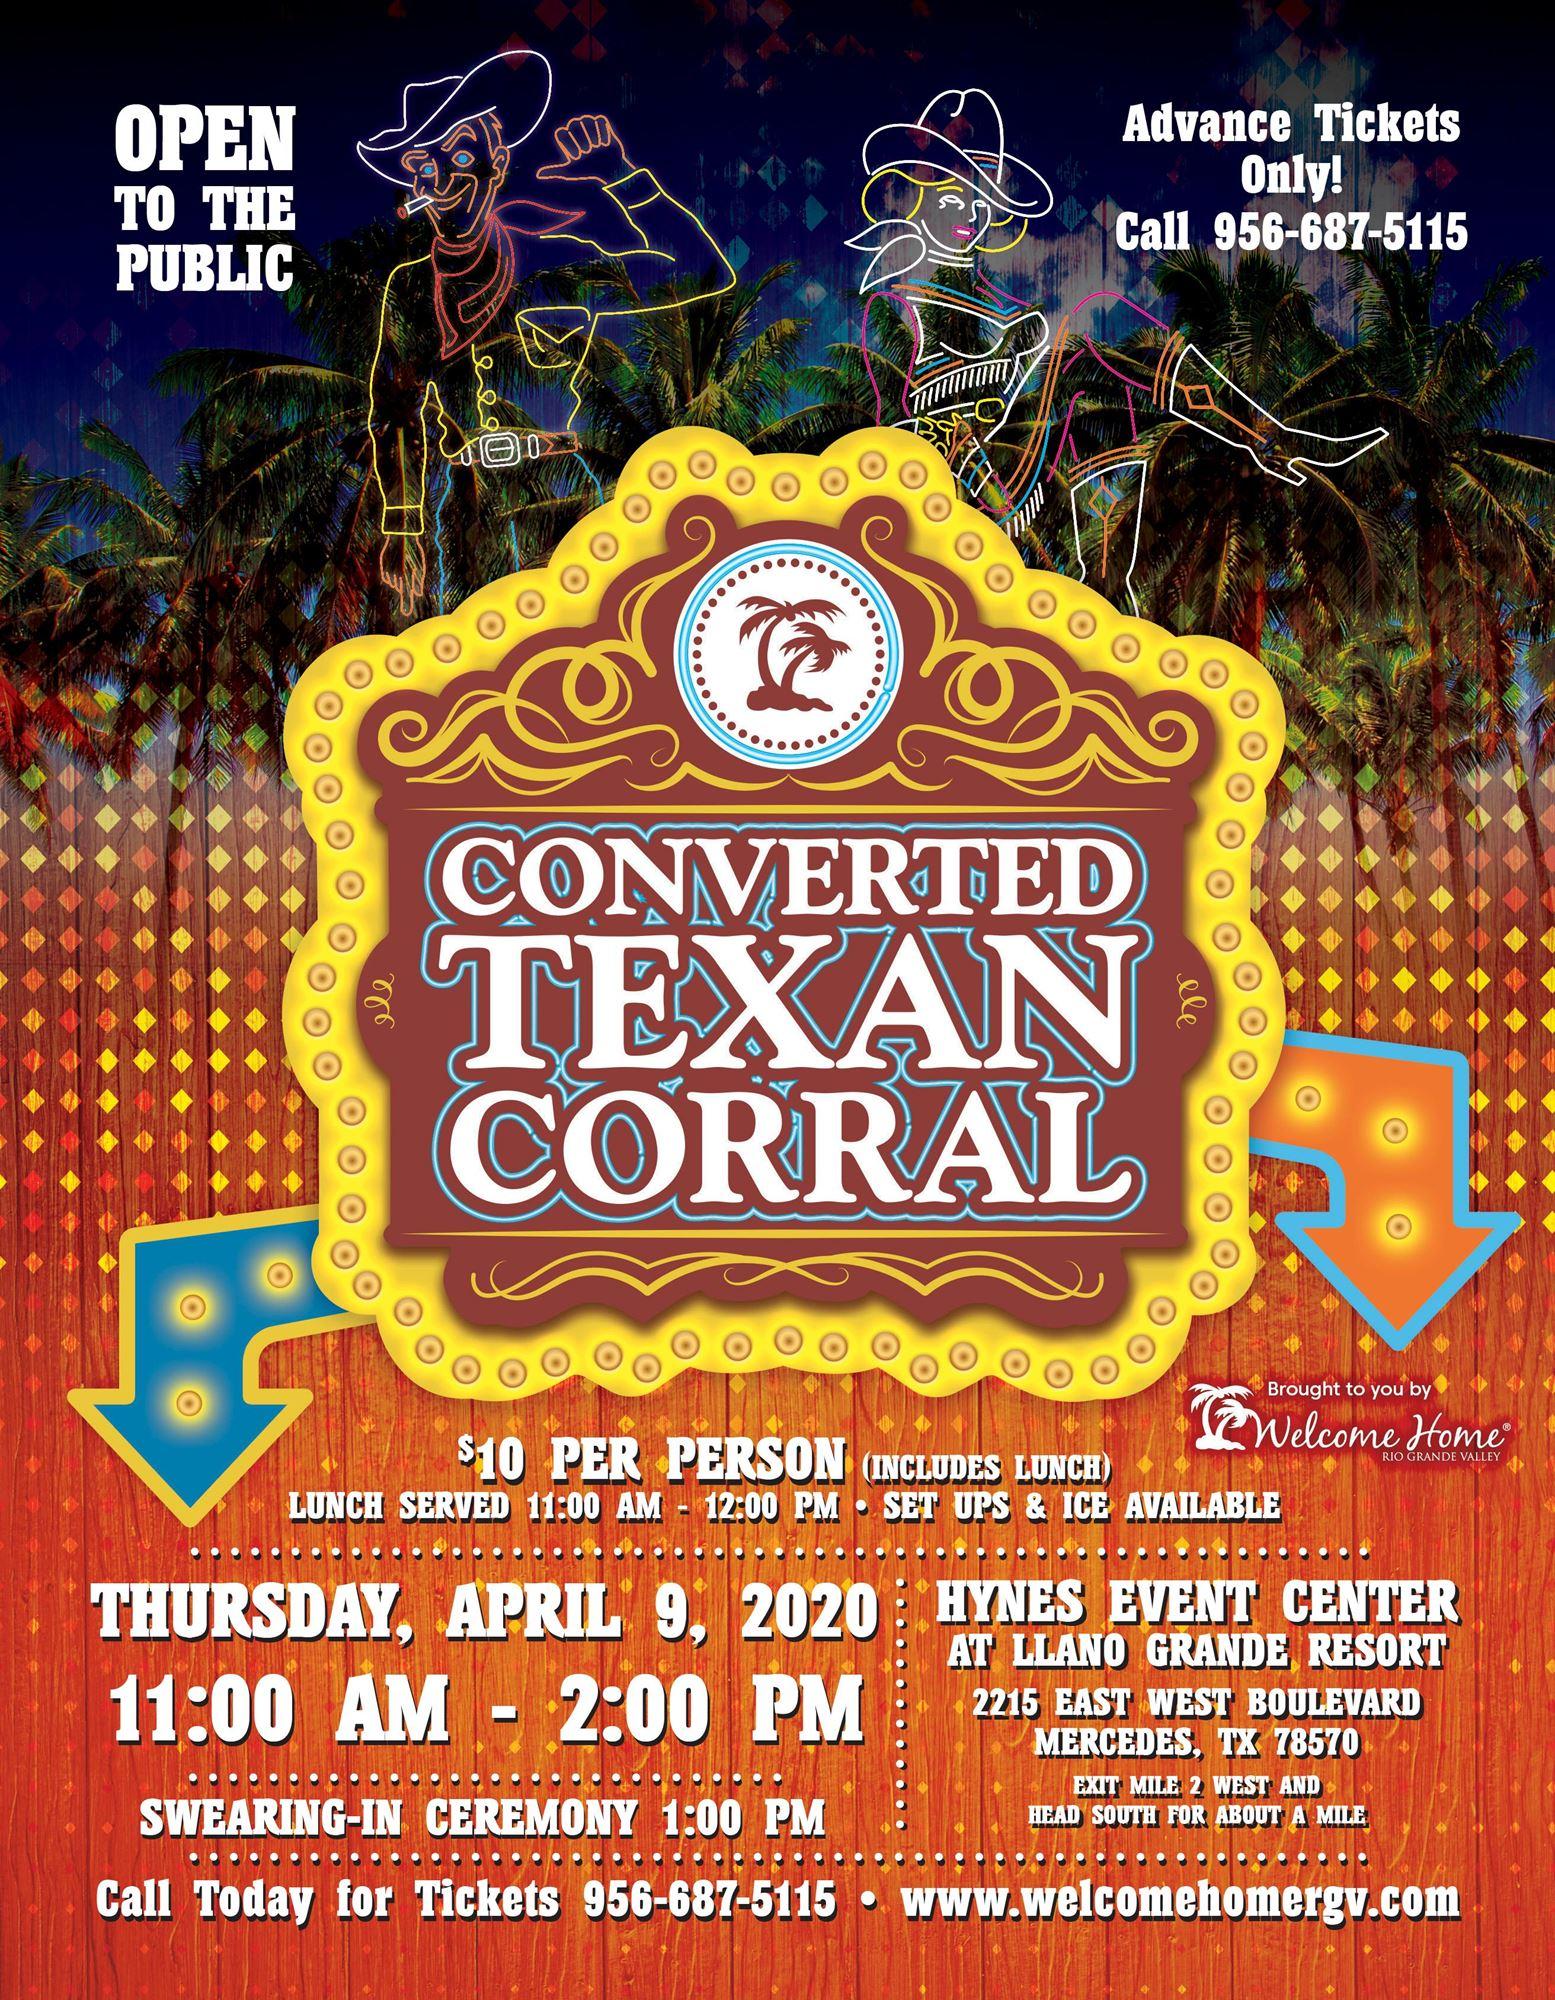 Converted Texan Corral